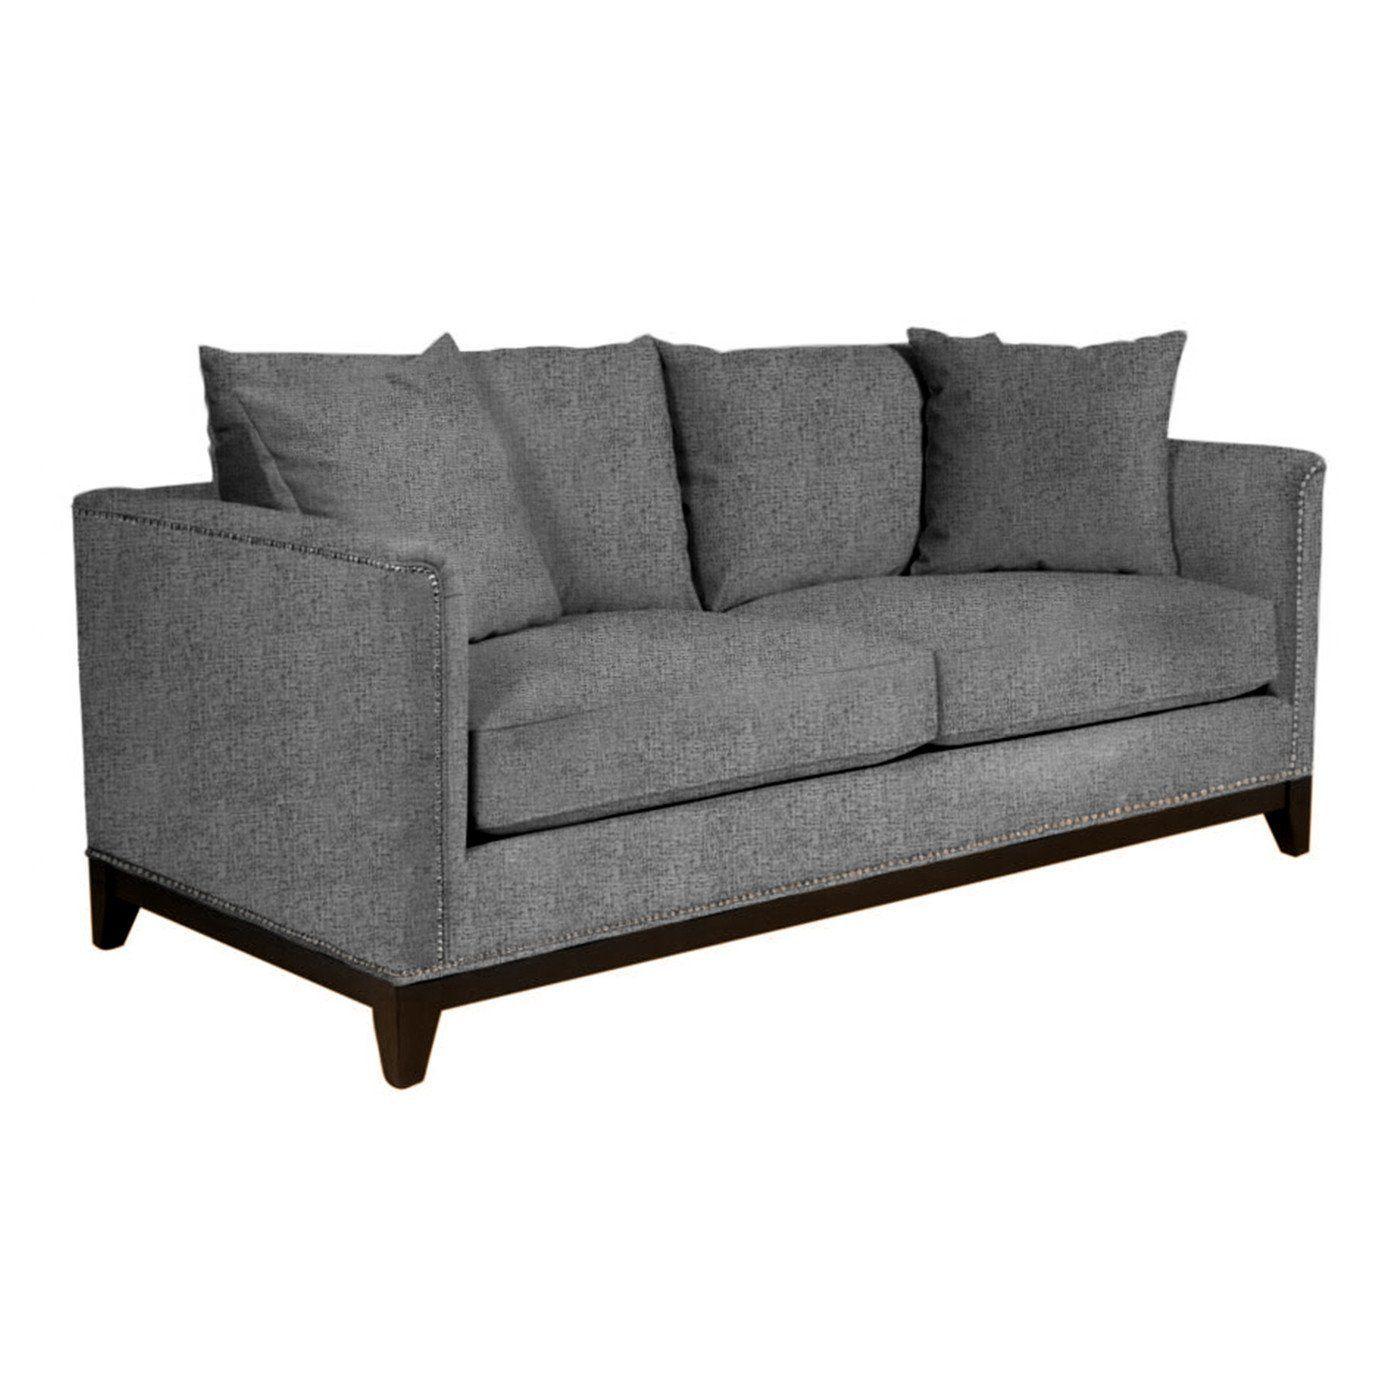 La Brea Studded Sofa CHOICE OF FABRICS